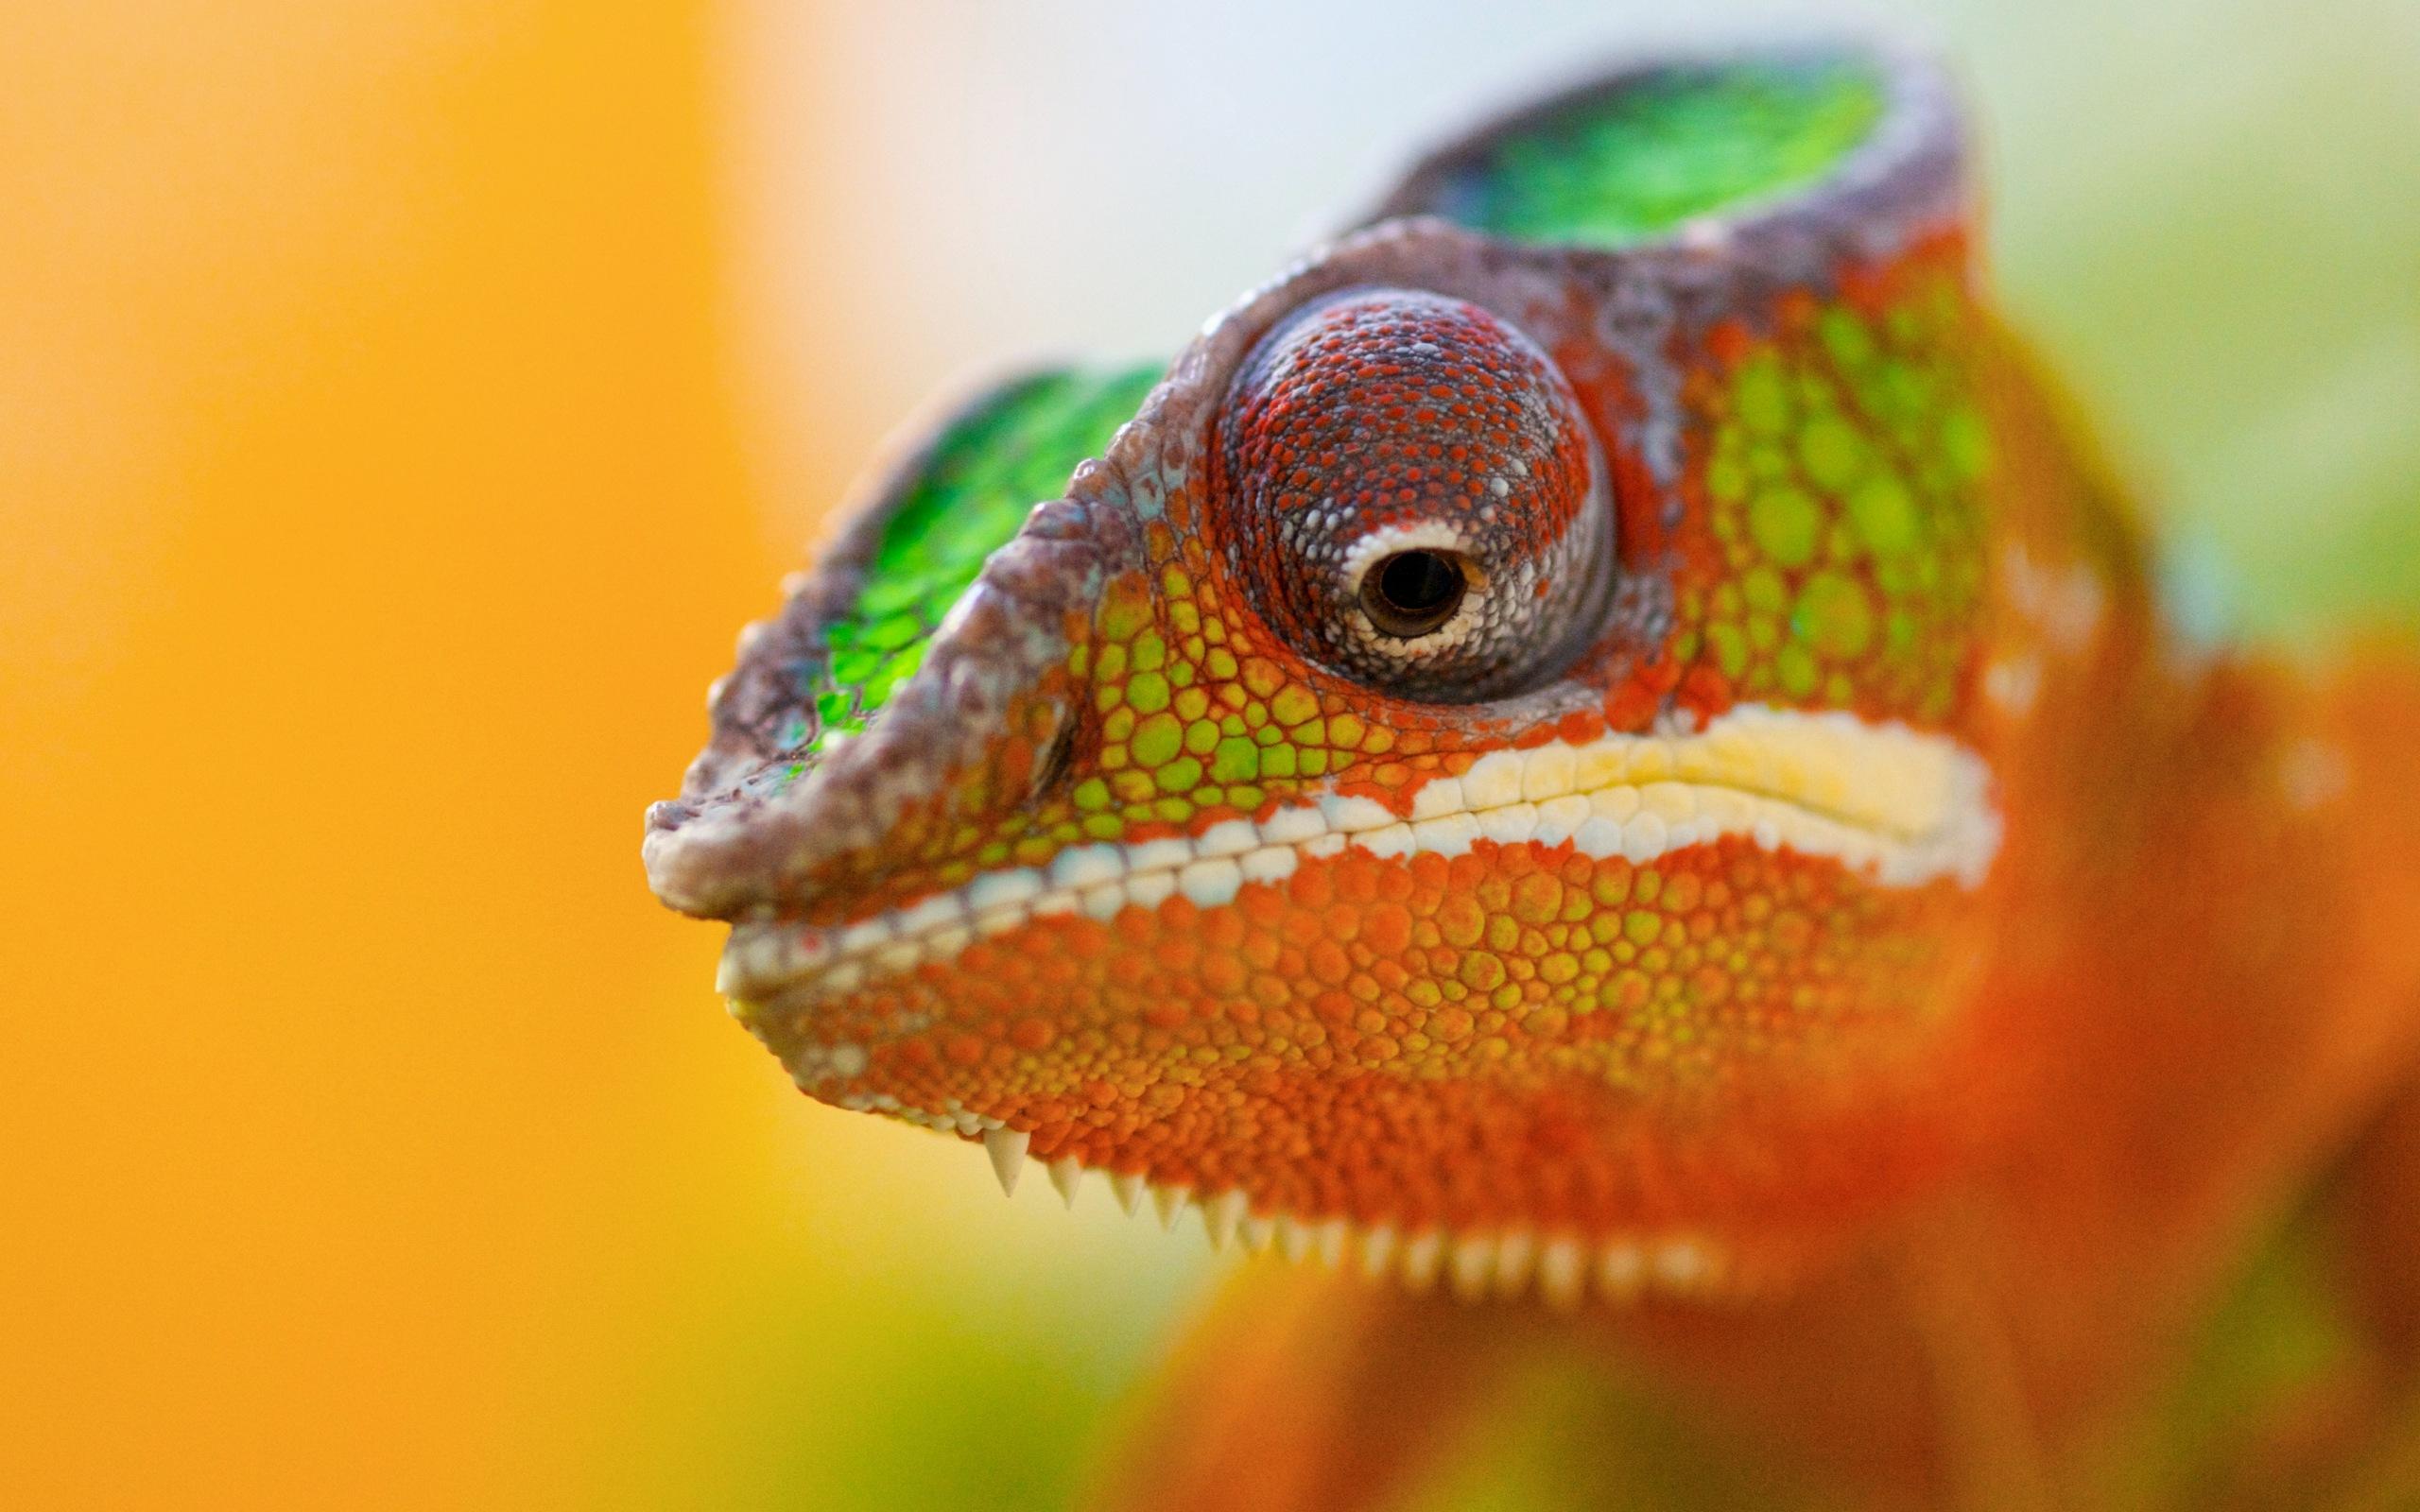 хамелеон, ящерица, цветная